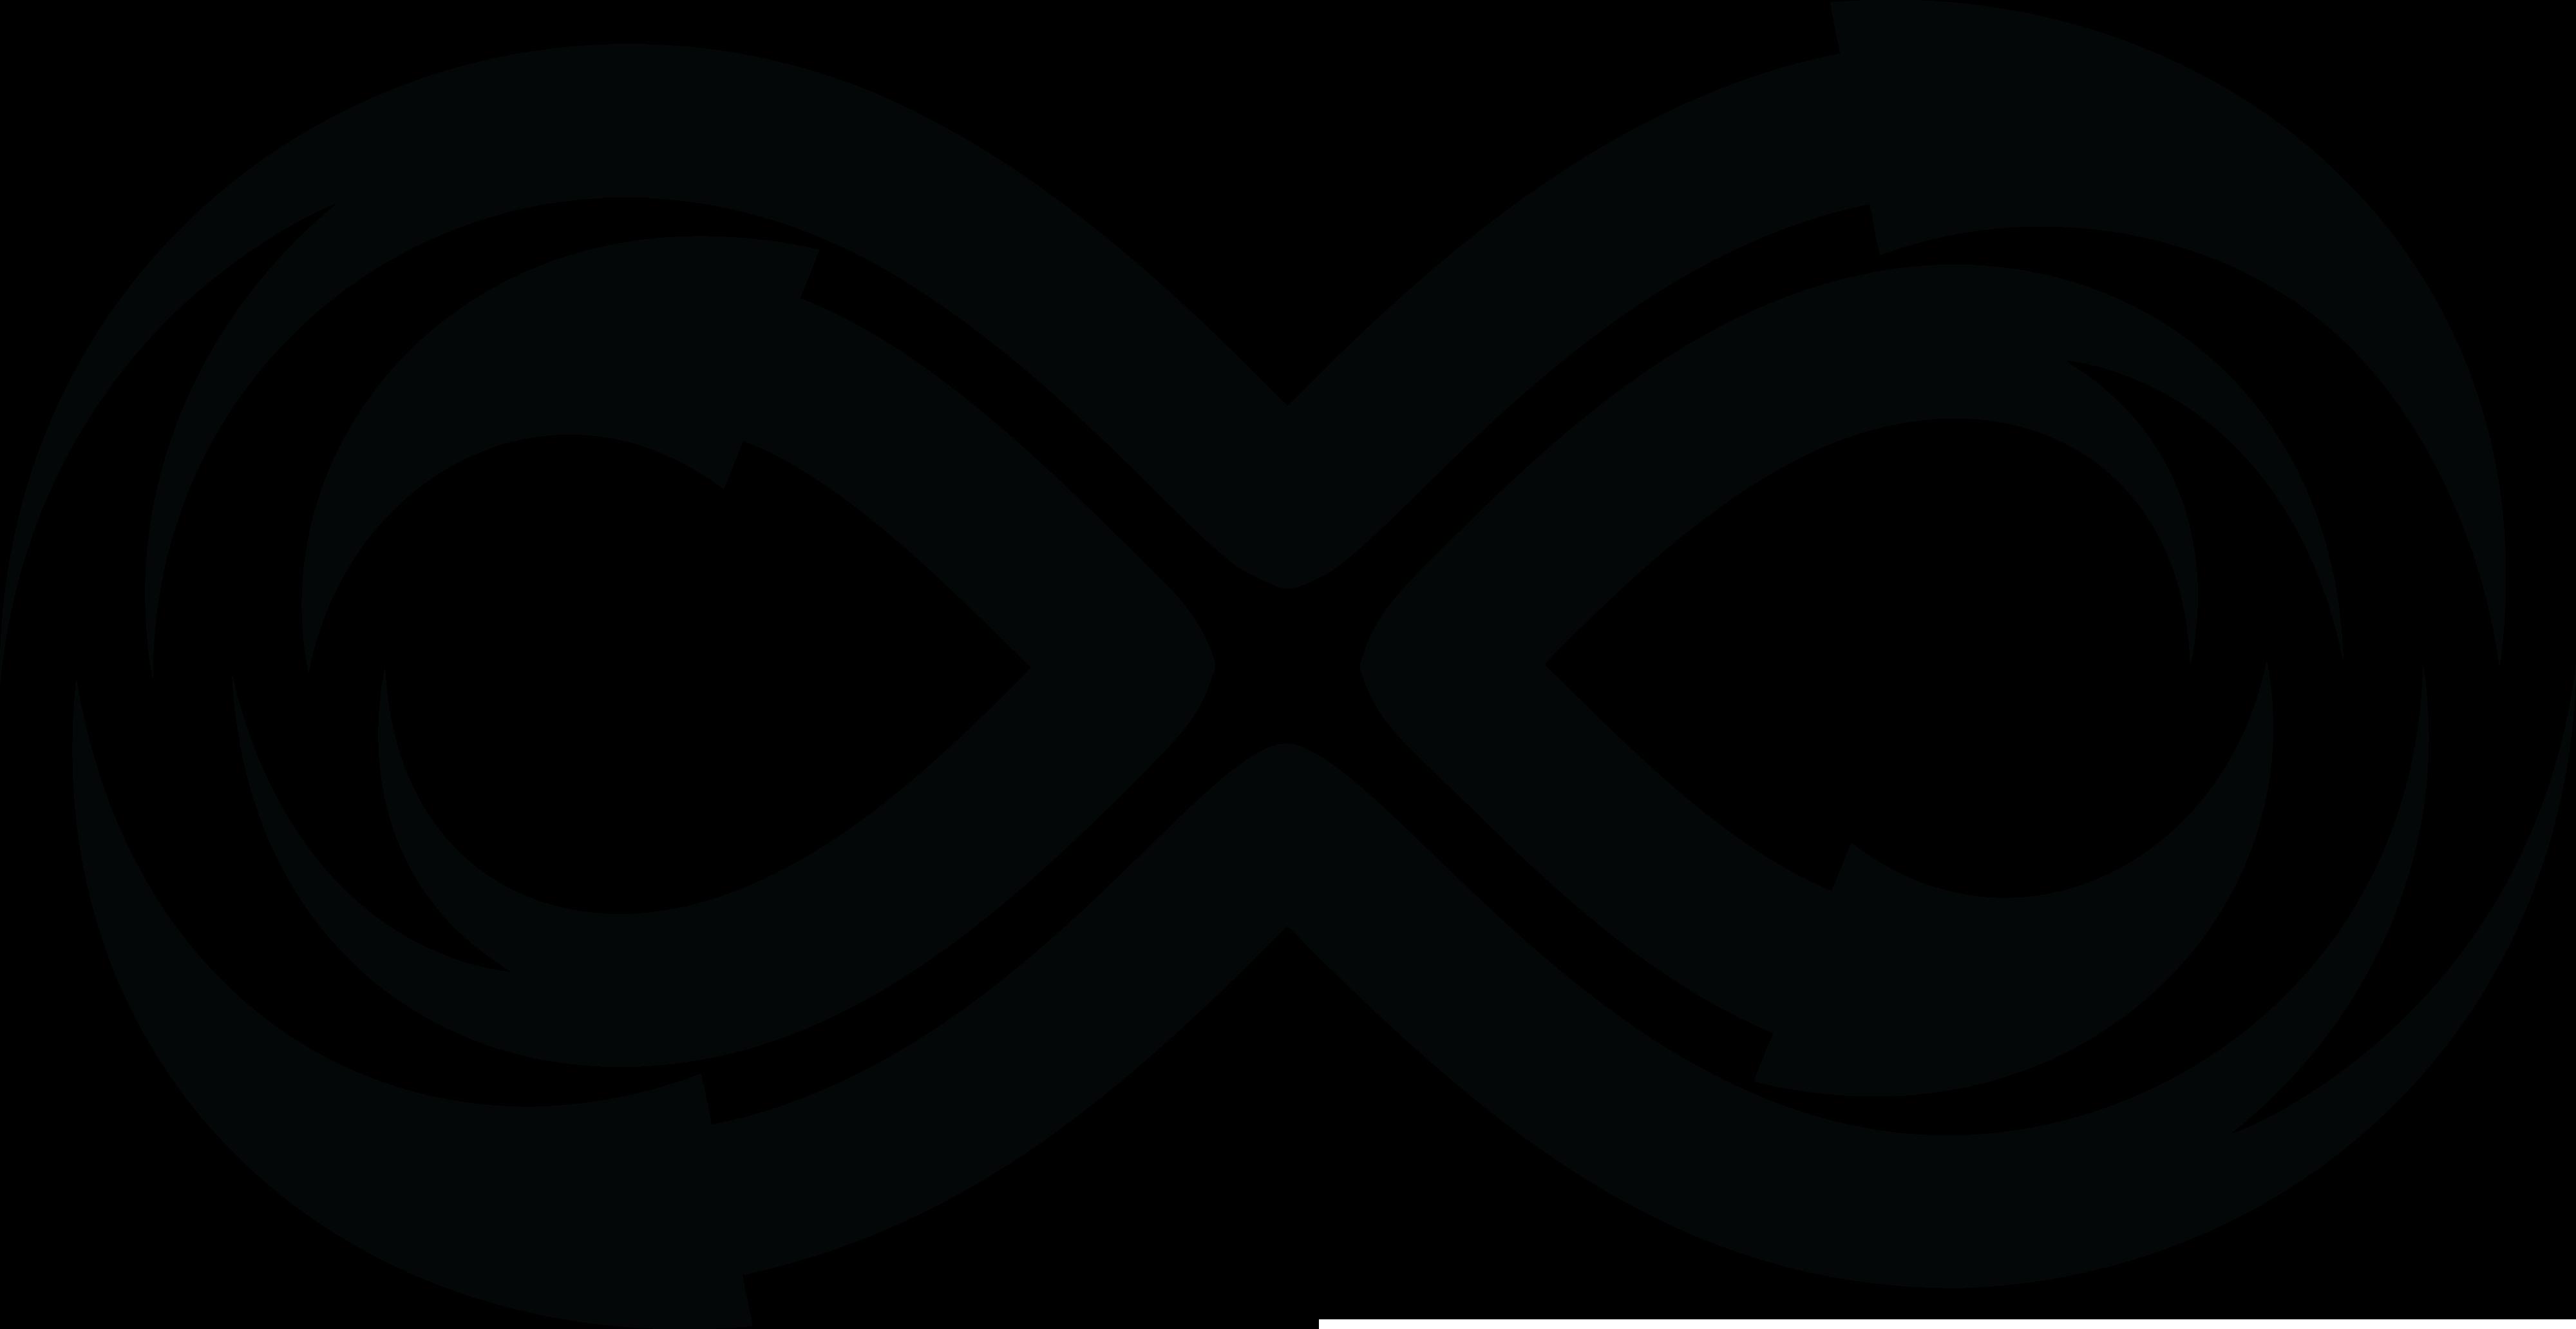 Free clipart of a black and white arrow infinity symbol free clipart of a black and white arrow infinity symbol 0001383 buycottarizona Choice Image